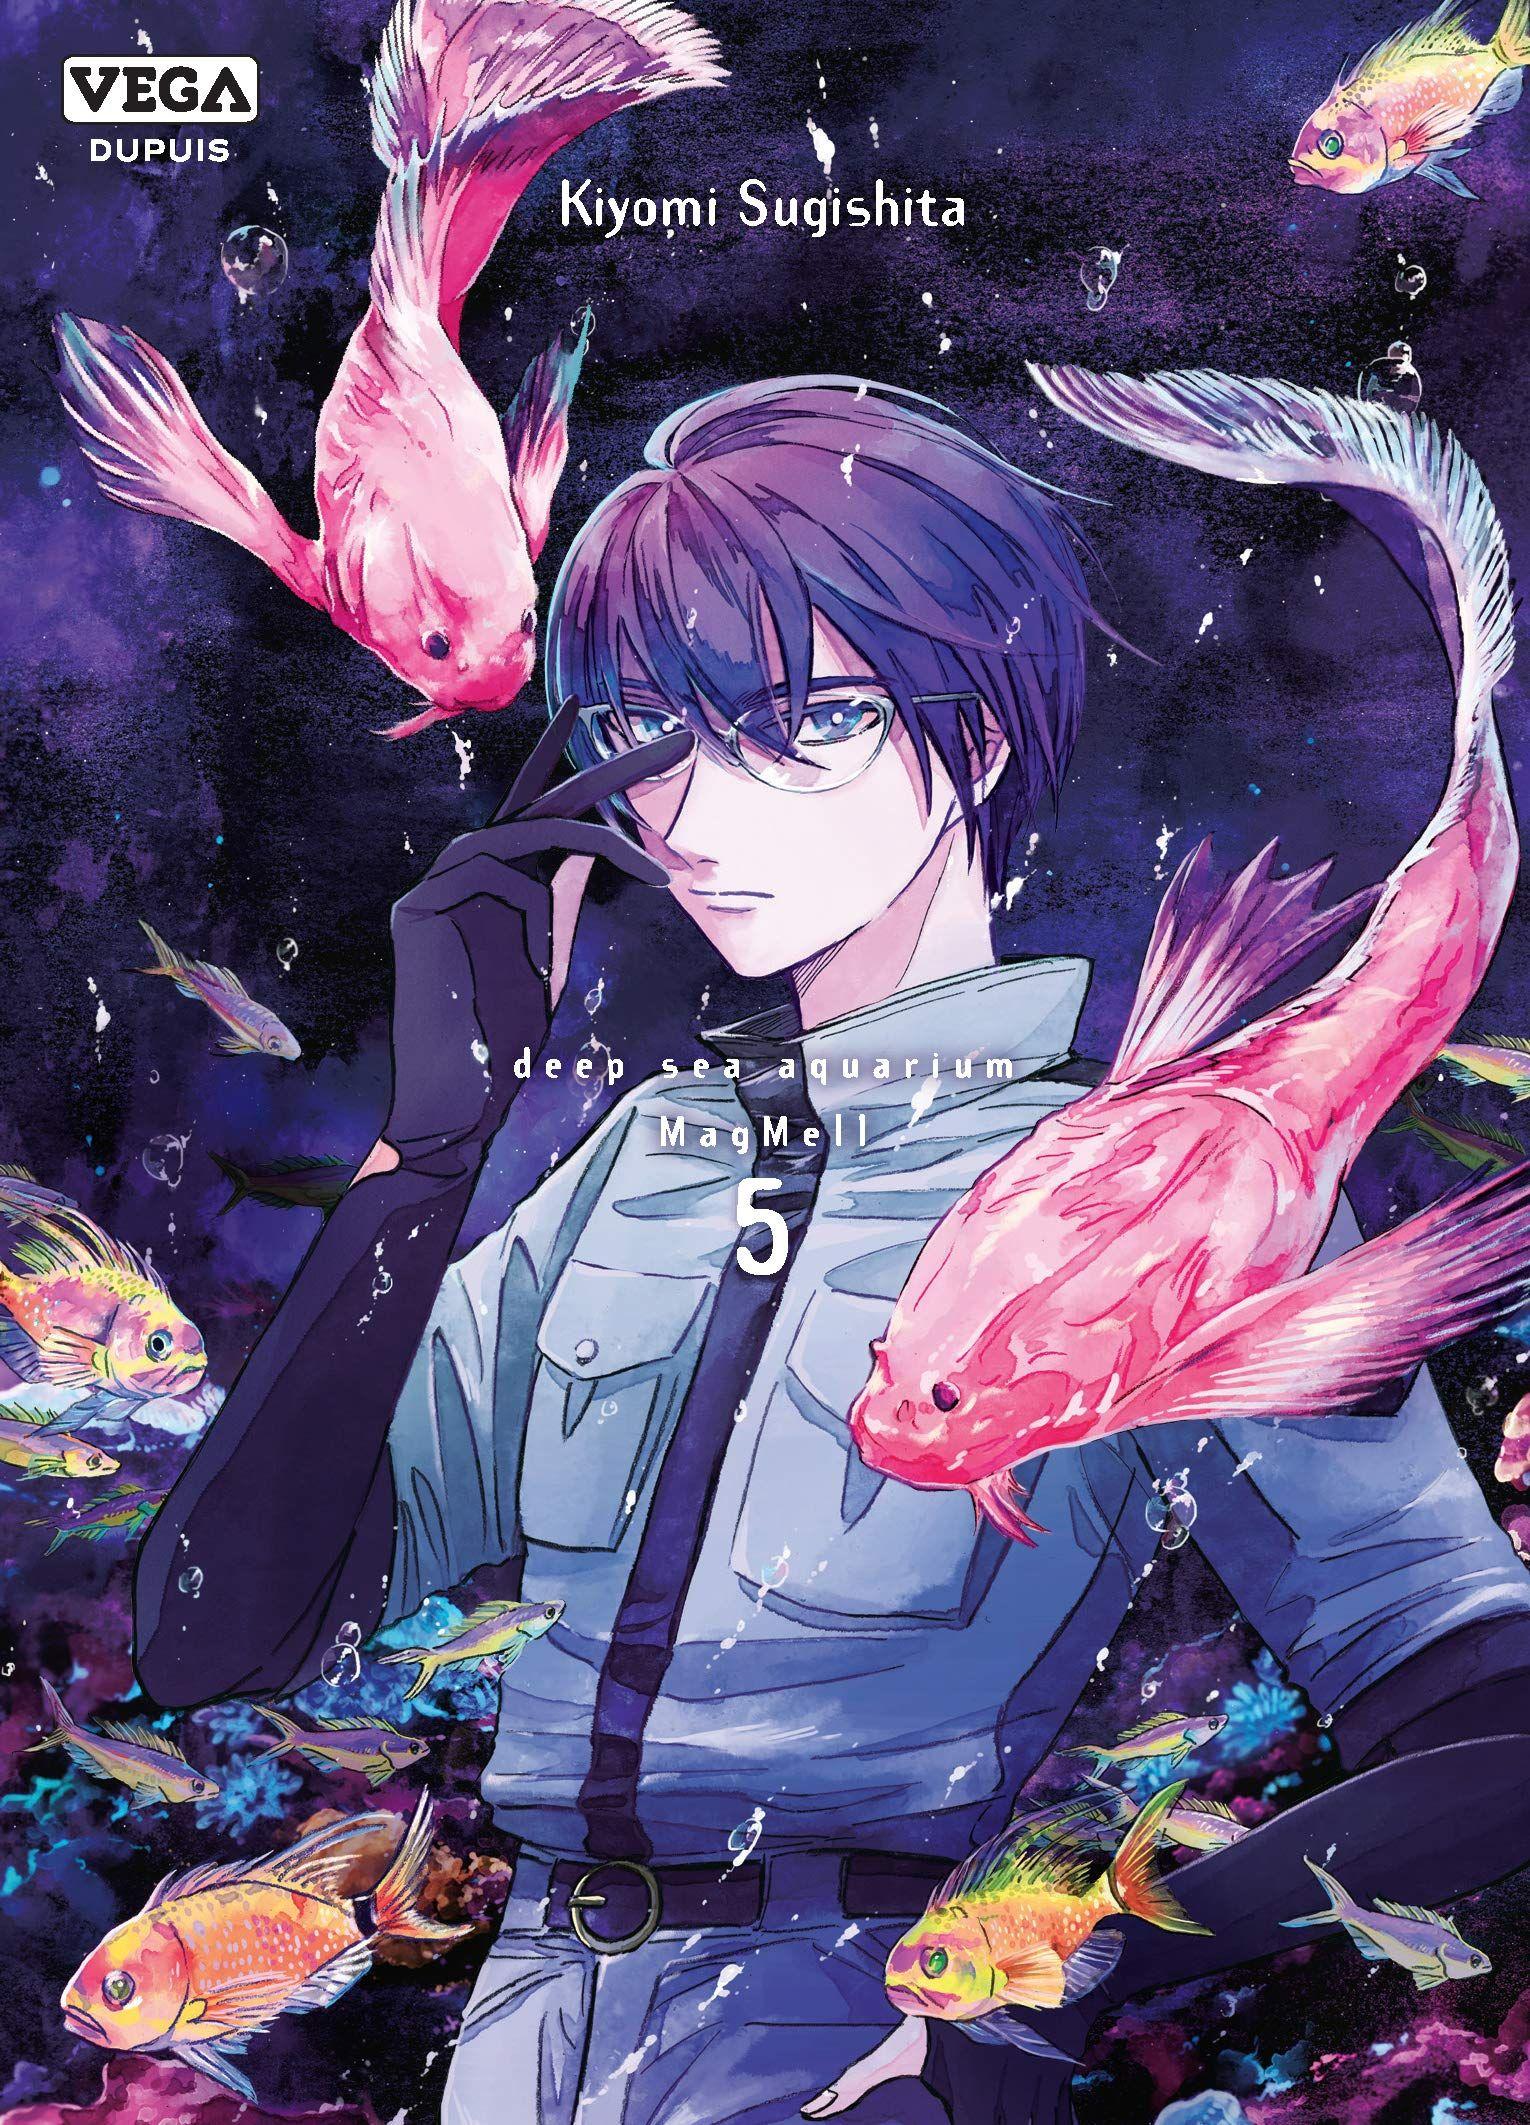 Manga - Manhwa - Deep Sea Aquarium Magmell Vol.5